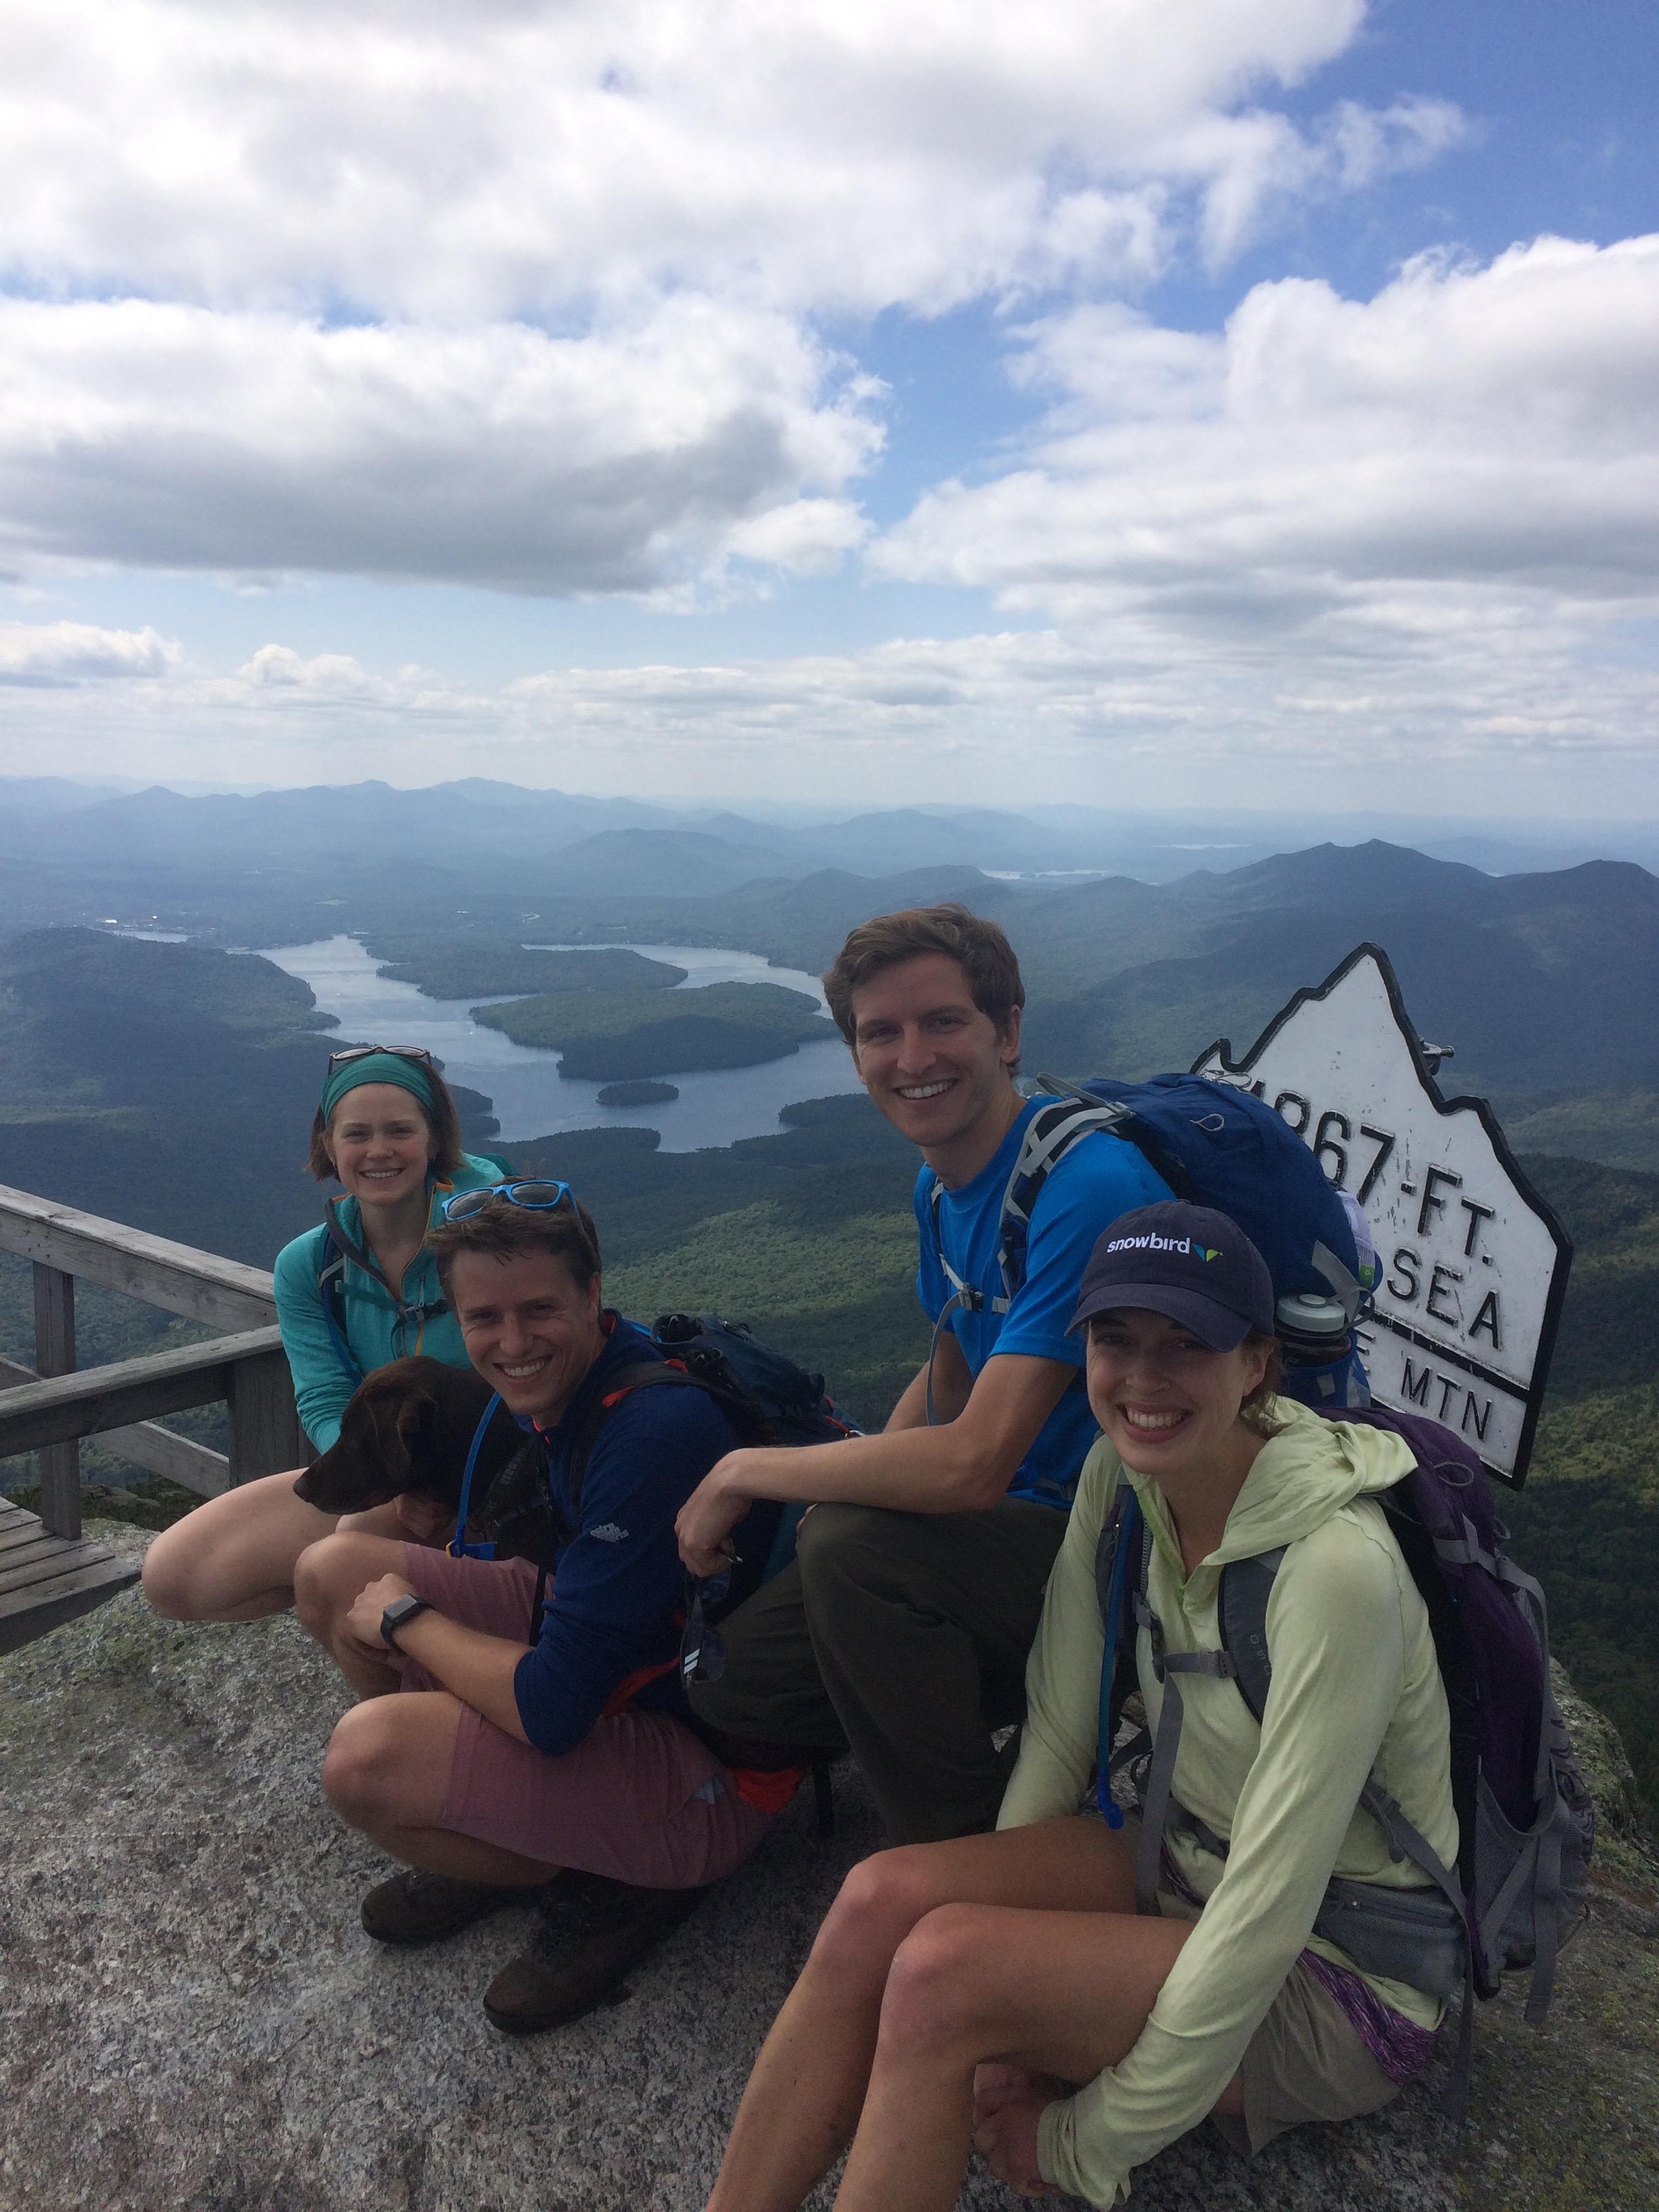 Summit of Whiteface Mountain, Lack Placid, NY